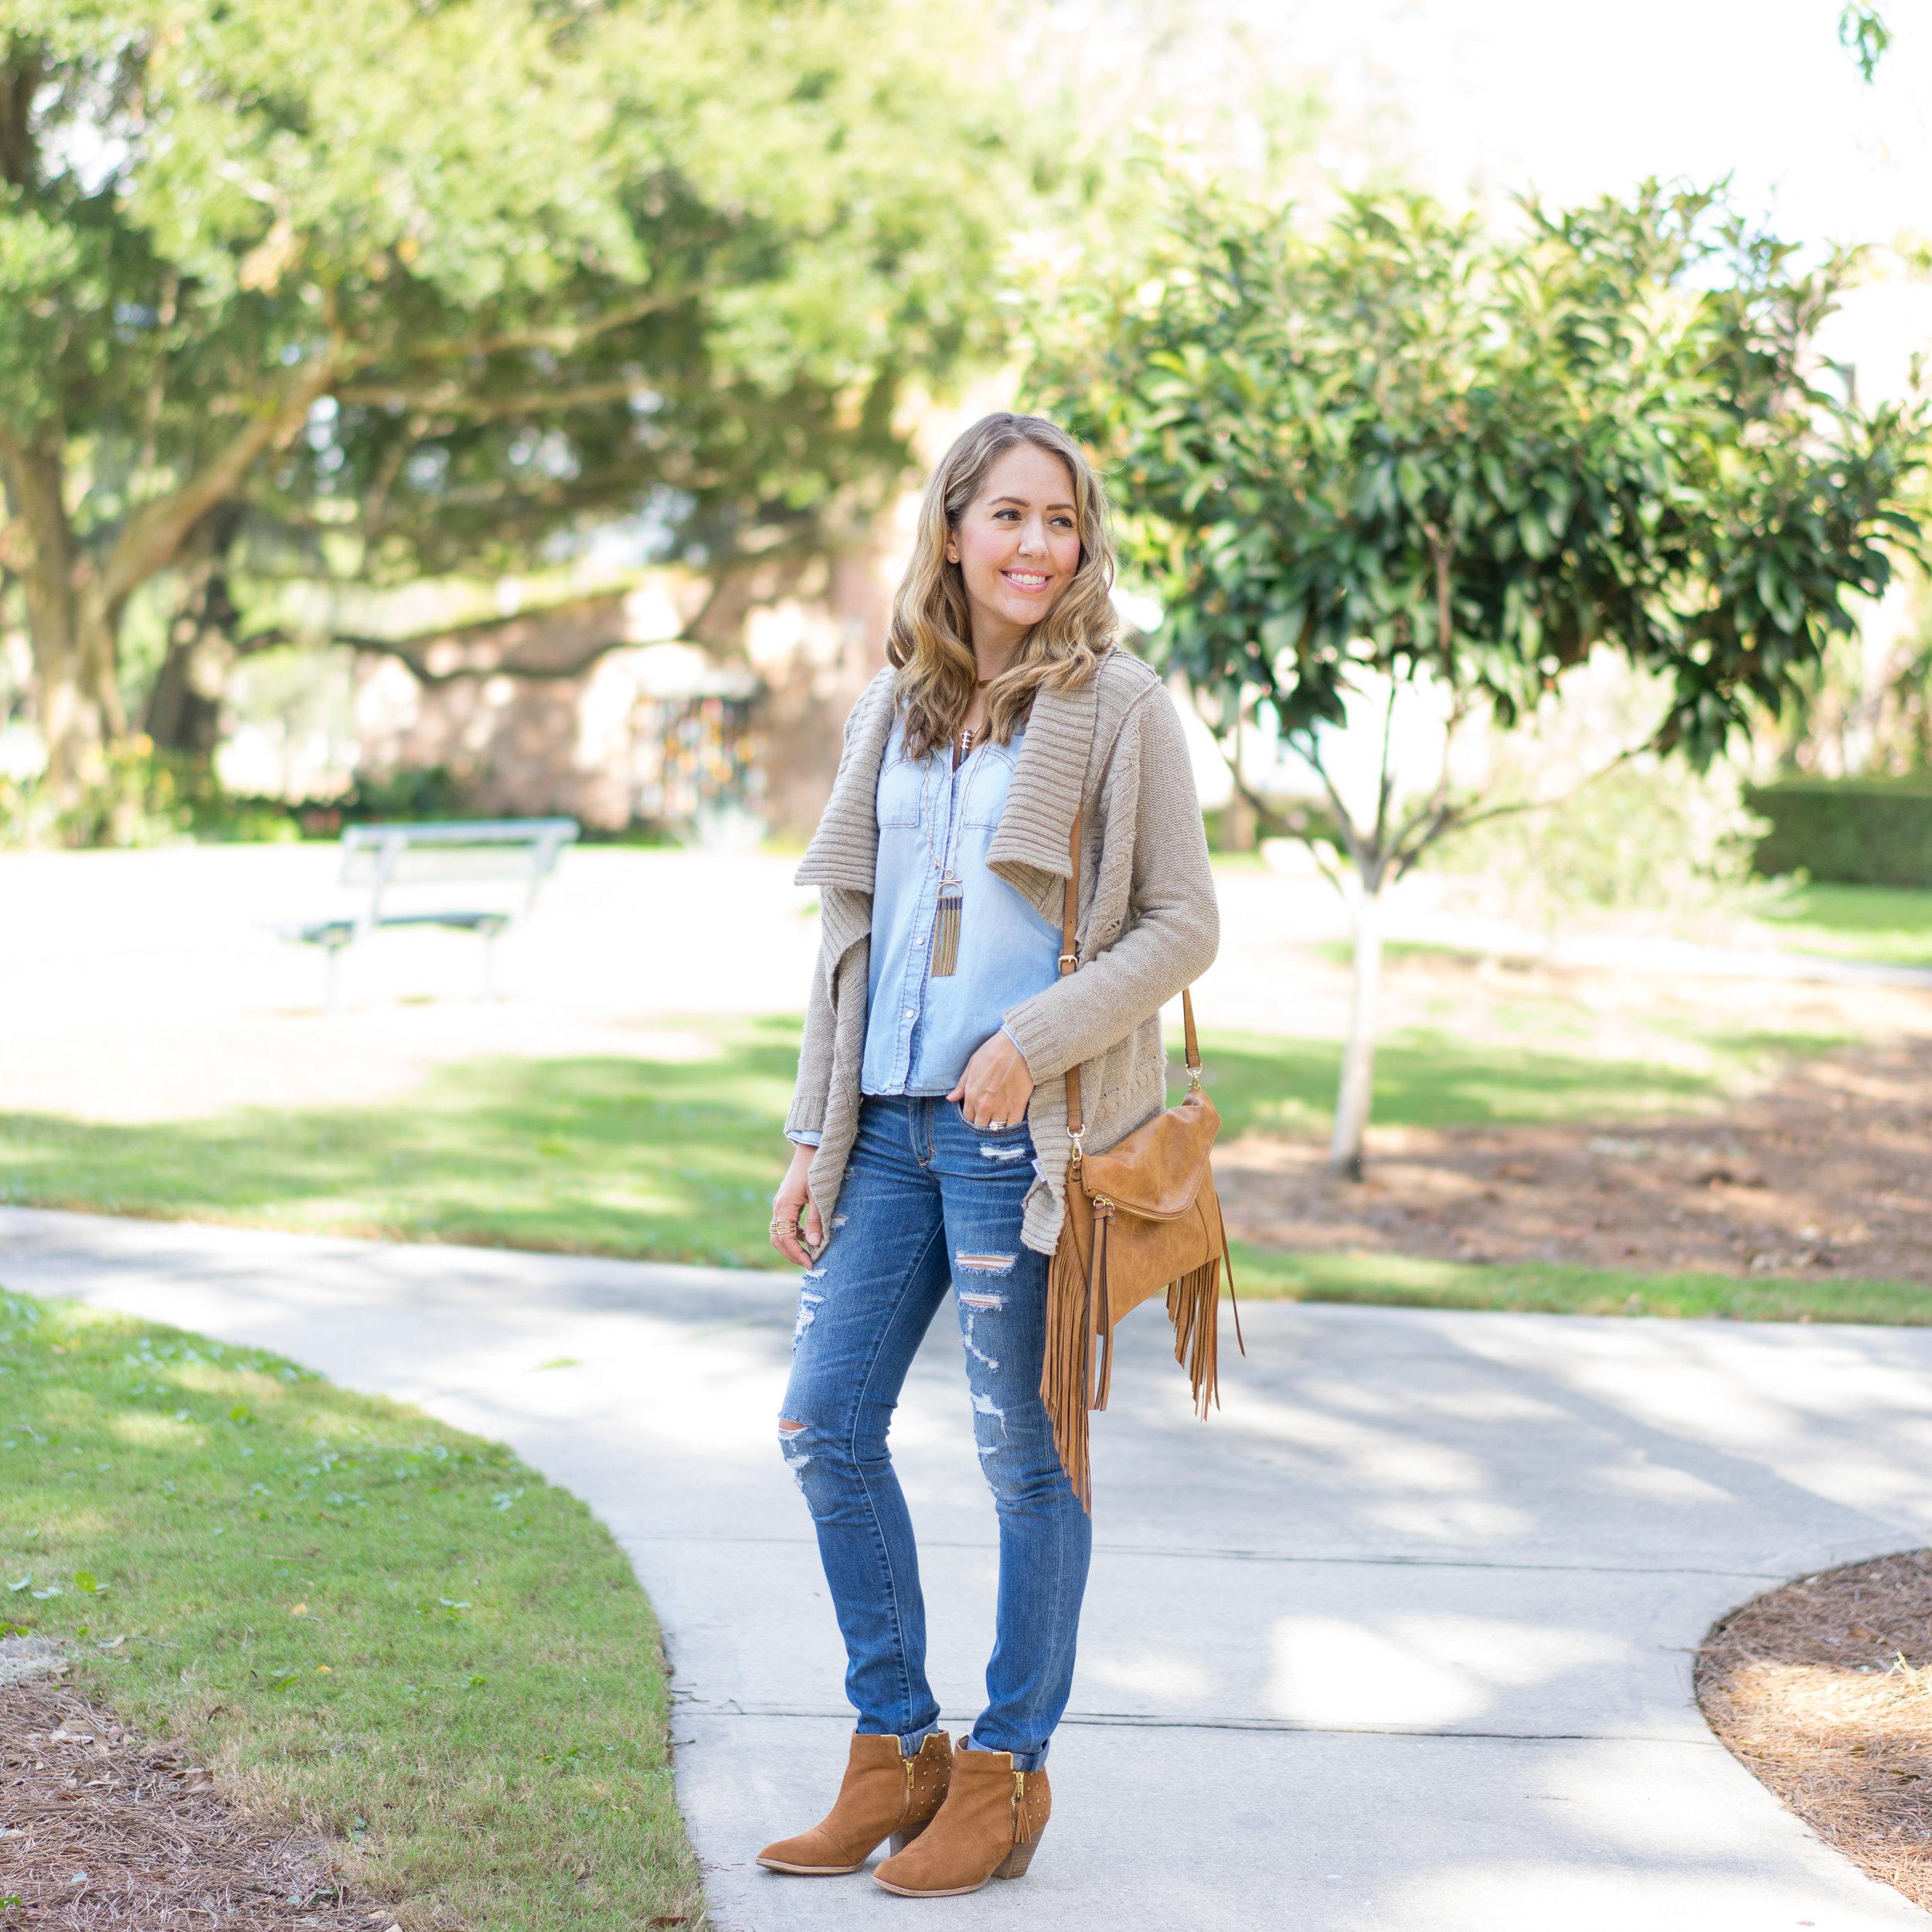 Cozy sweater, fringe purse, chambray shirt